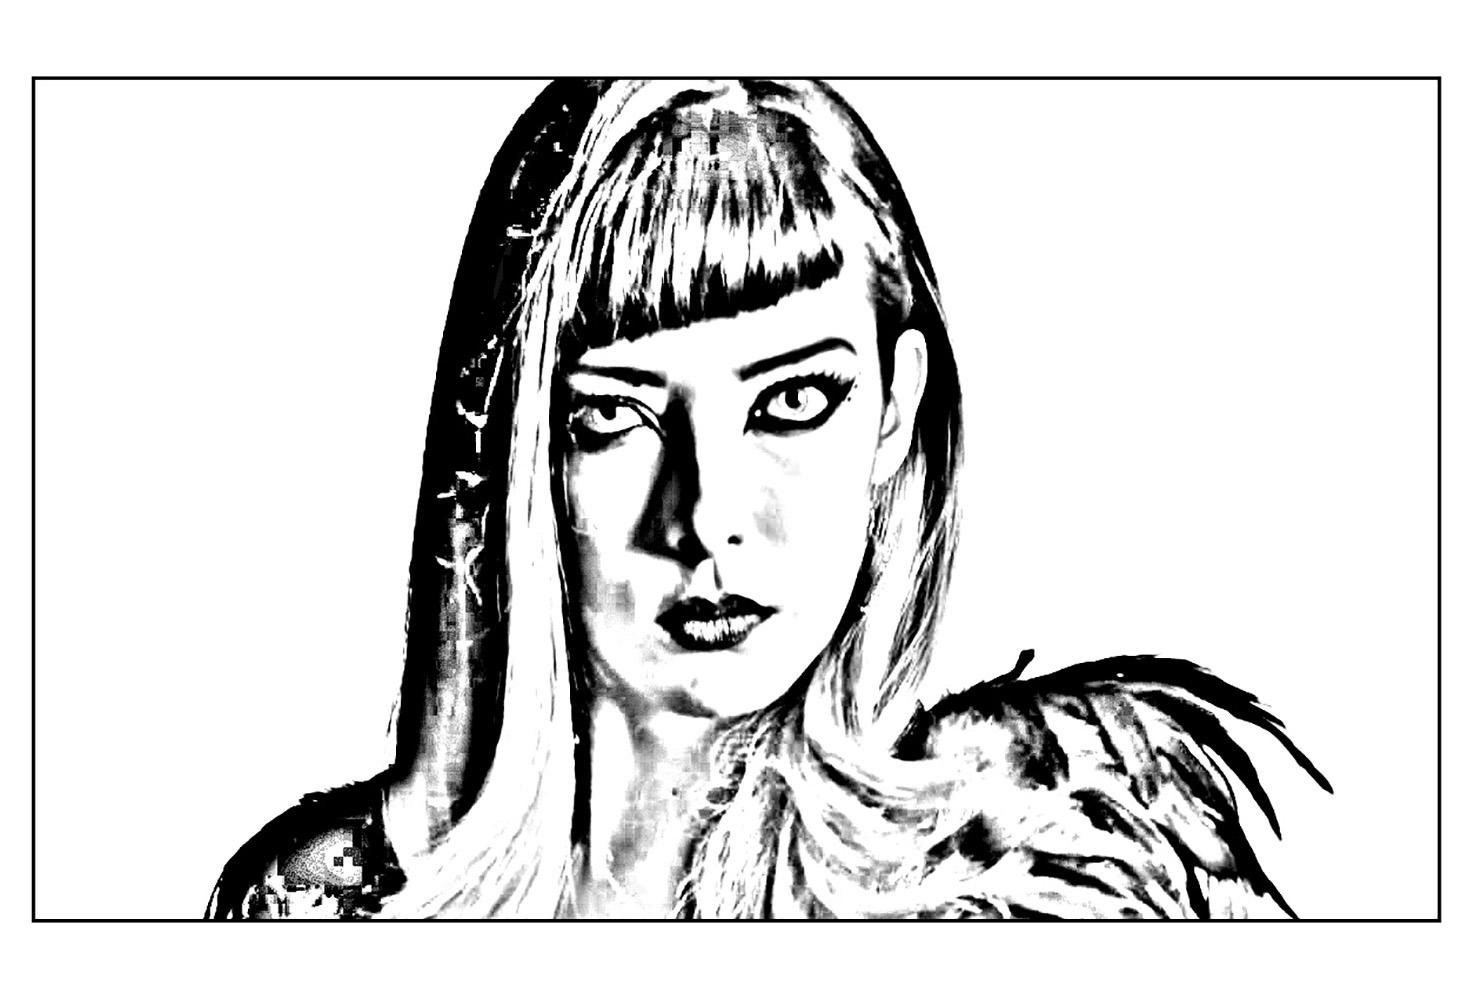 Chica vampiro catalina coloriage chica vampiro - Coloriage de vampire a imprimer ...